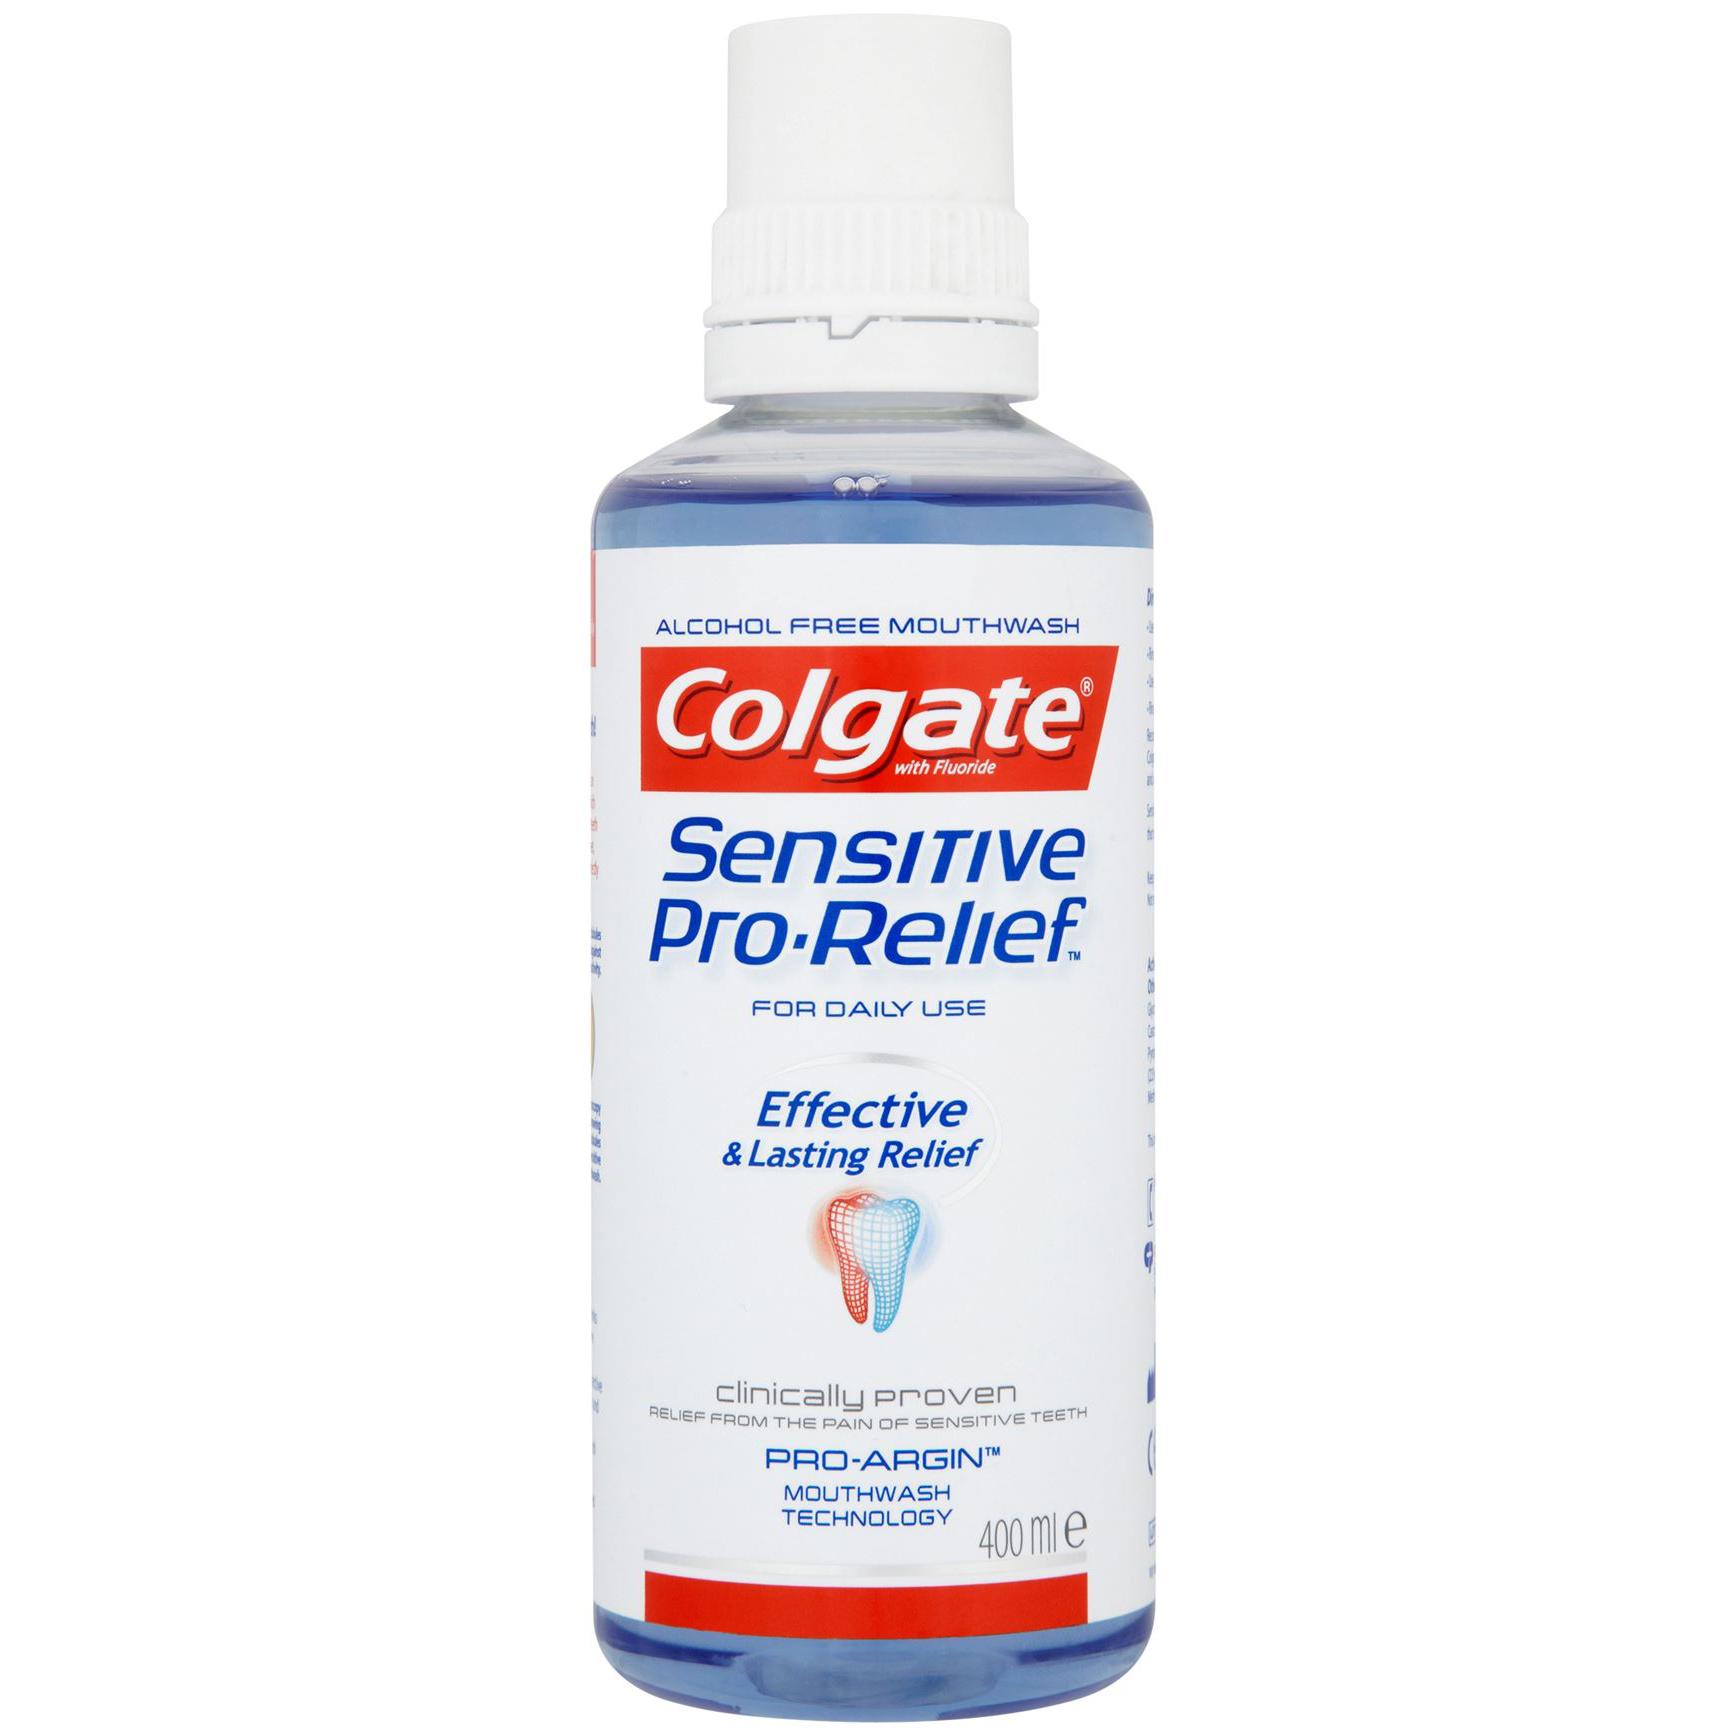 Colgate® Sensitive Pro-Relief™ Στοματικό Διάλυμα Για Μείωση Της Οδοντινικής Υπερευαισθησίας 400ml